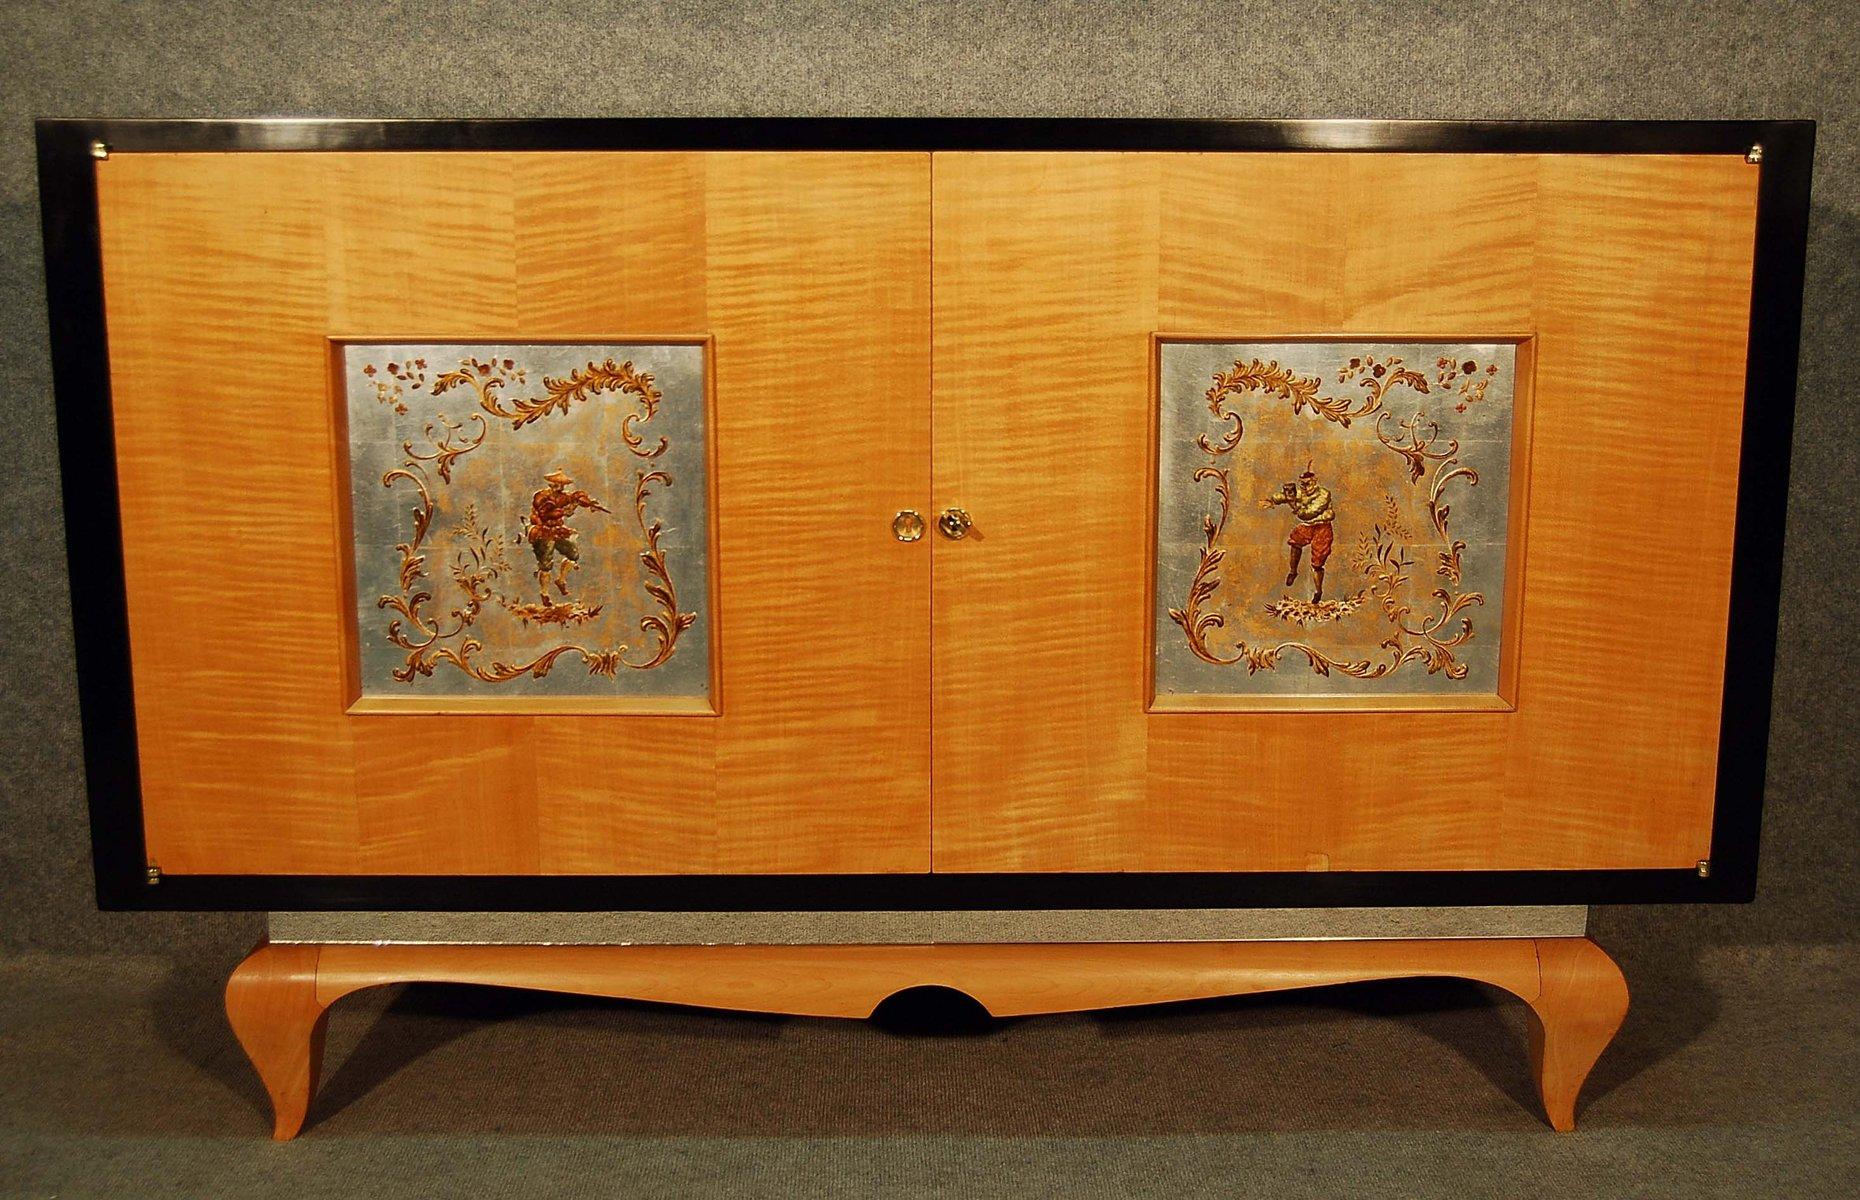 vintage french art d co sycamore cabinet 1940s for sale. Black Bedroom Furniture Sets. Home Design Ideas